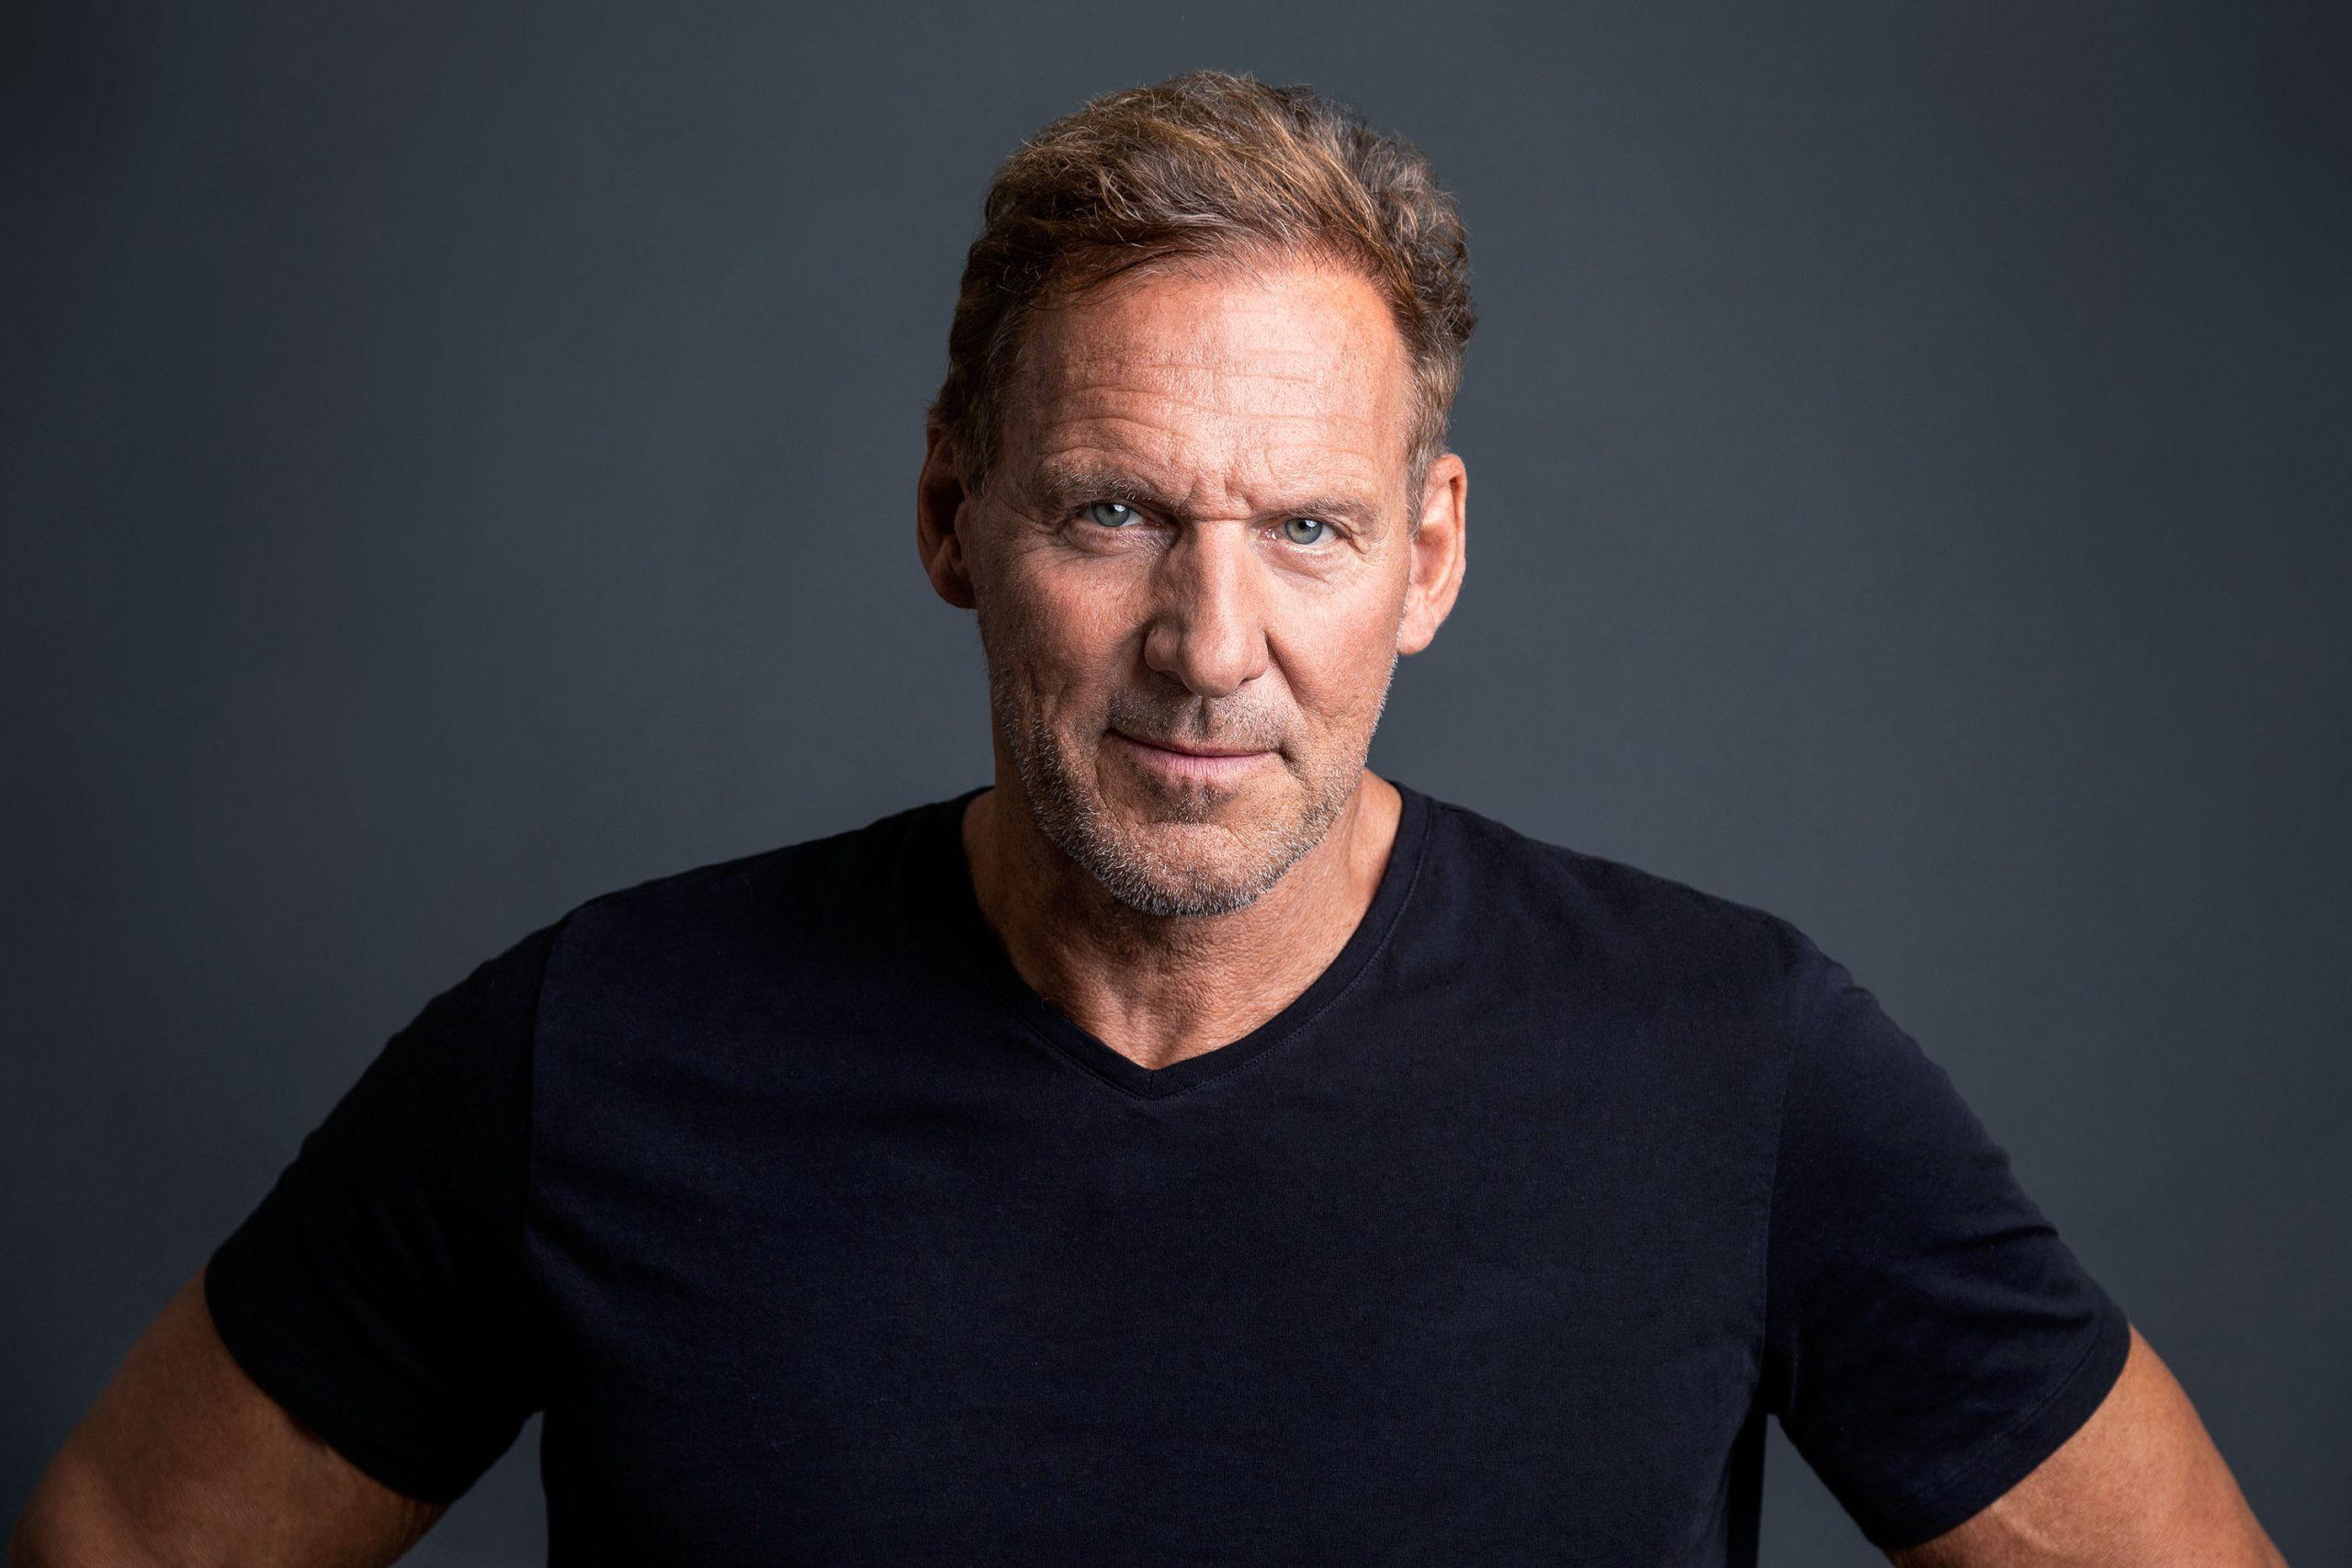 Ralf Moeller - Schauspieler